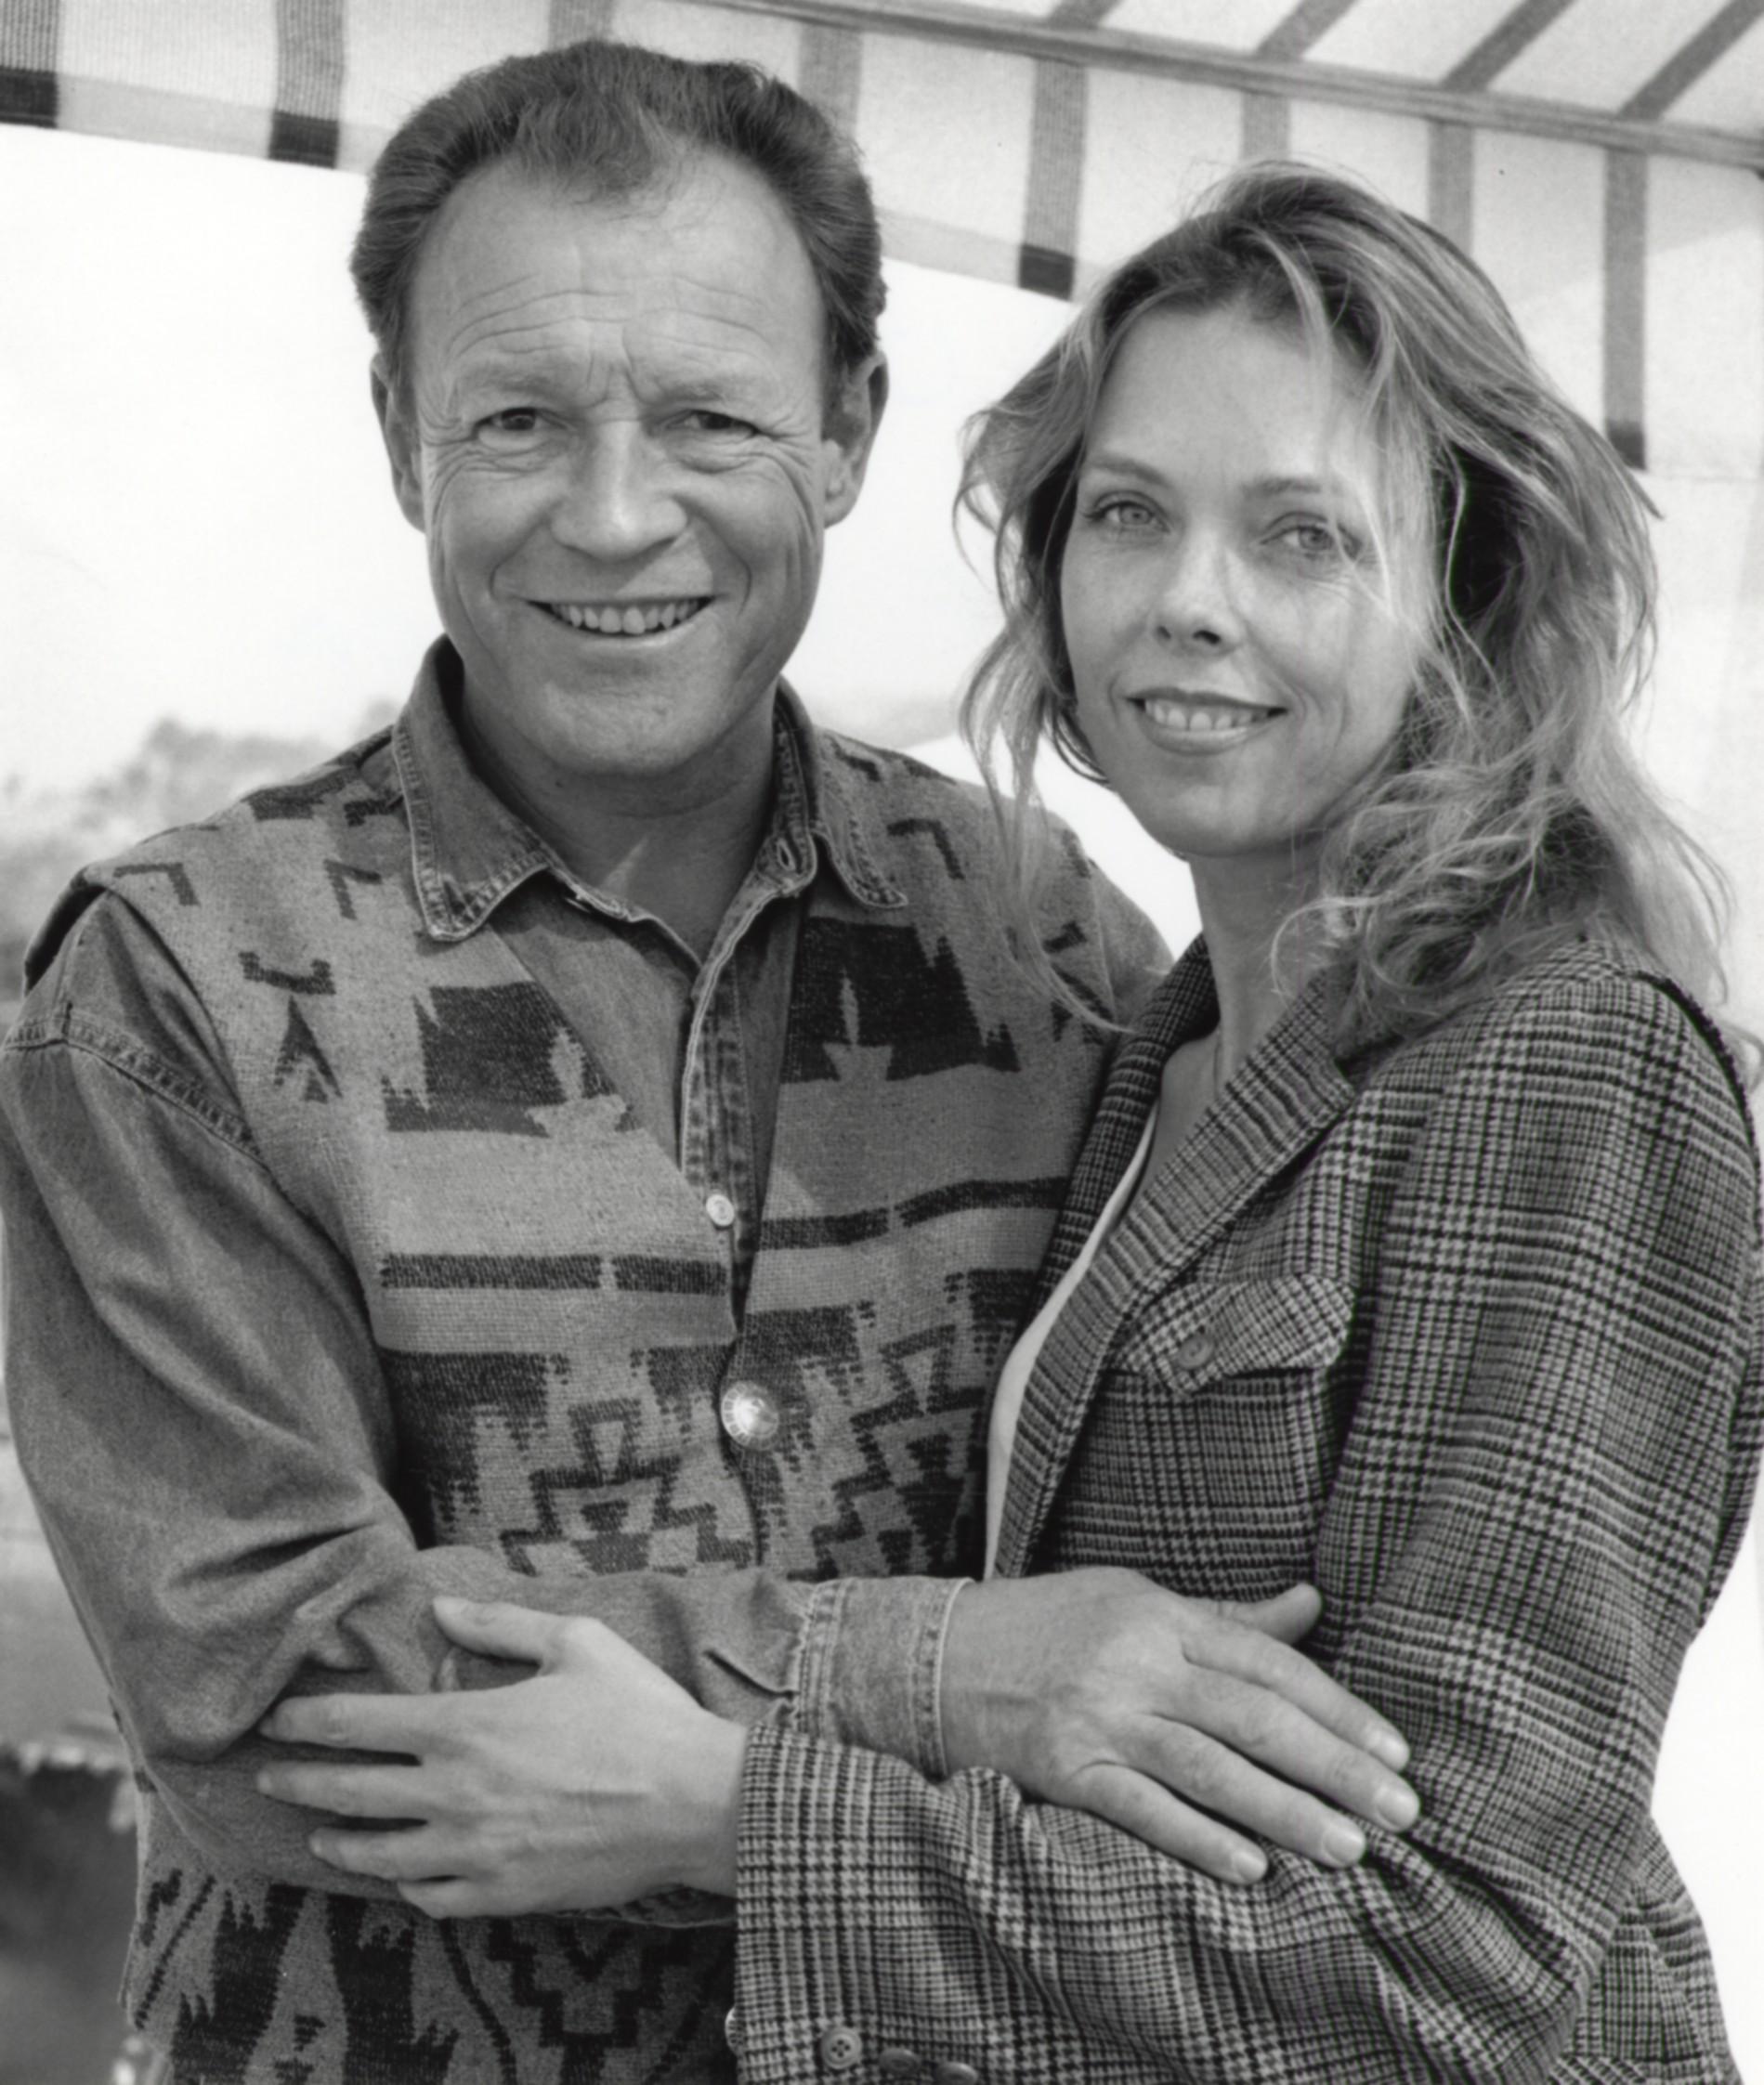 Dena & Danny - Pasadena CA 1994